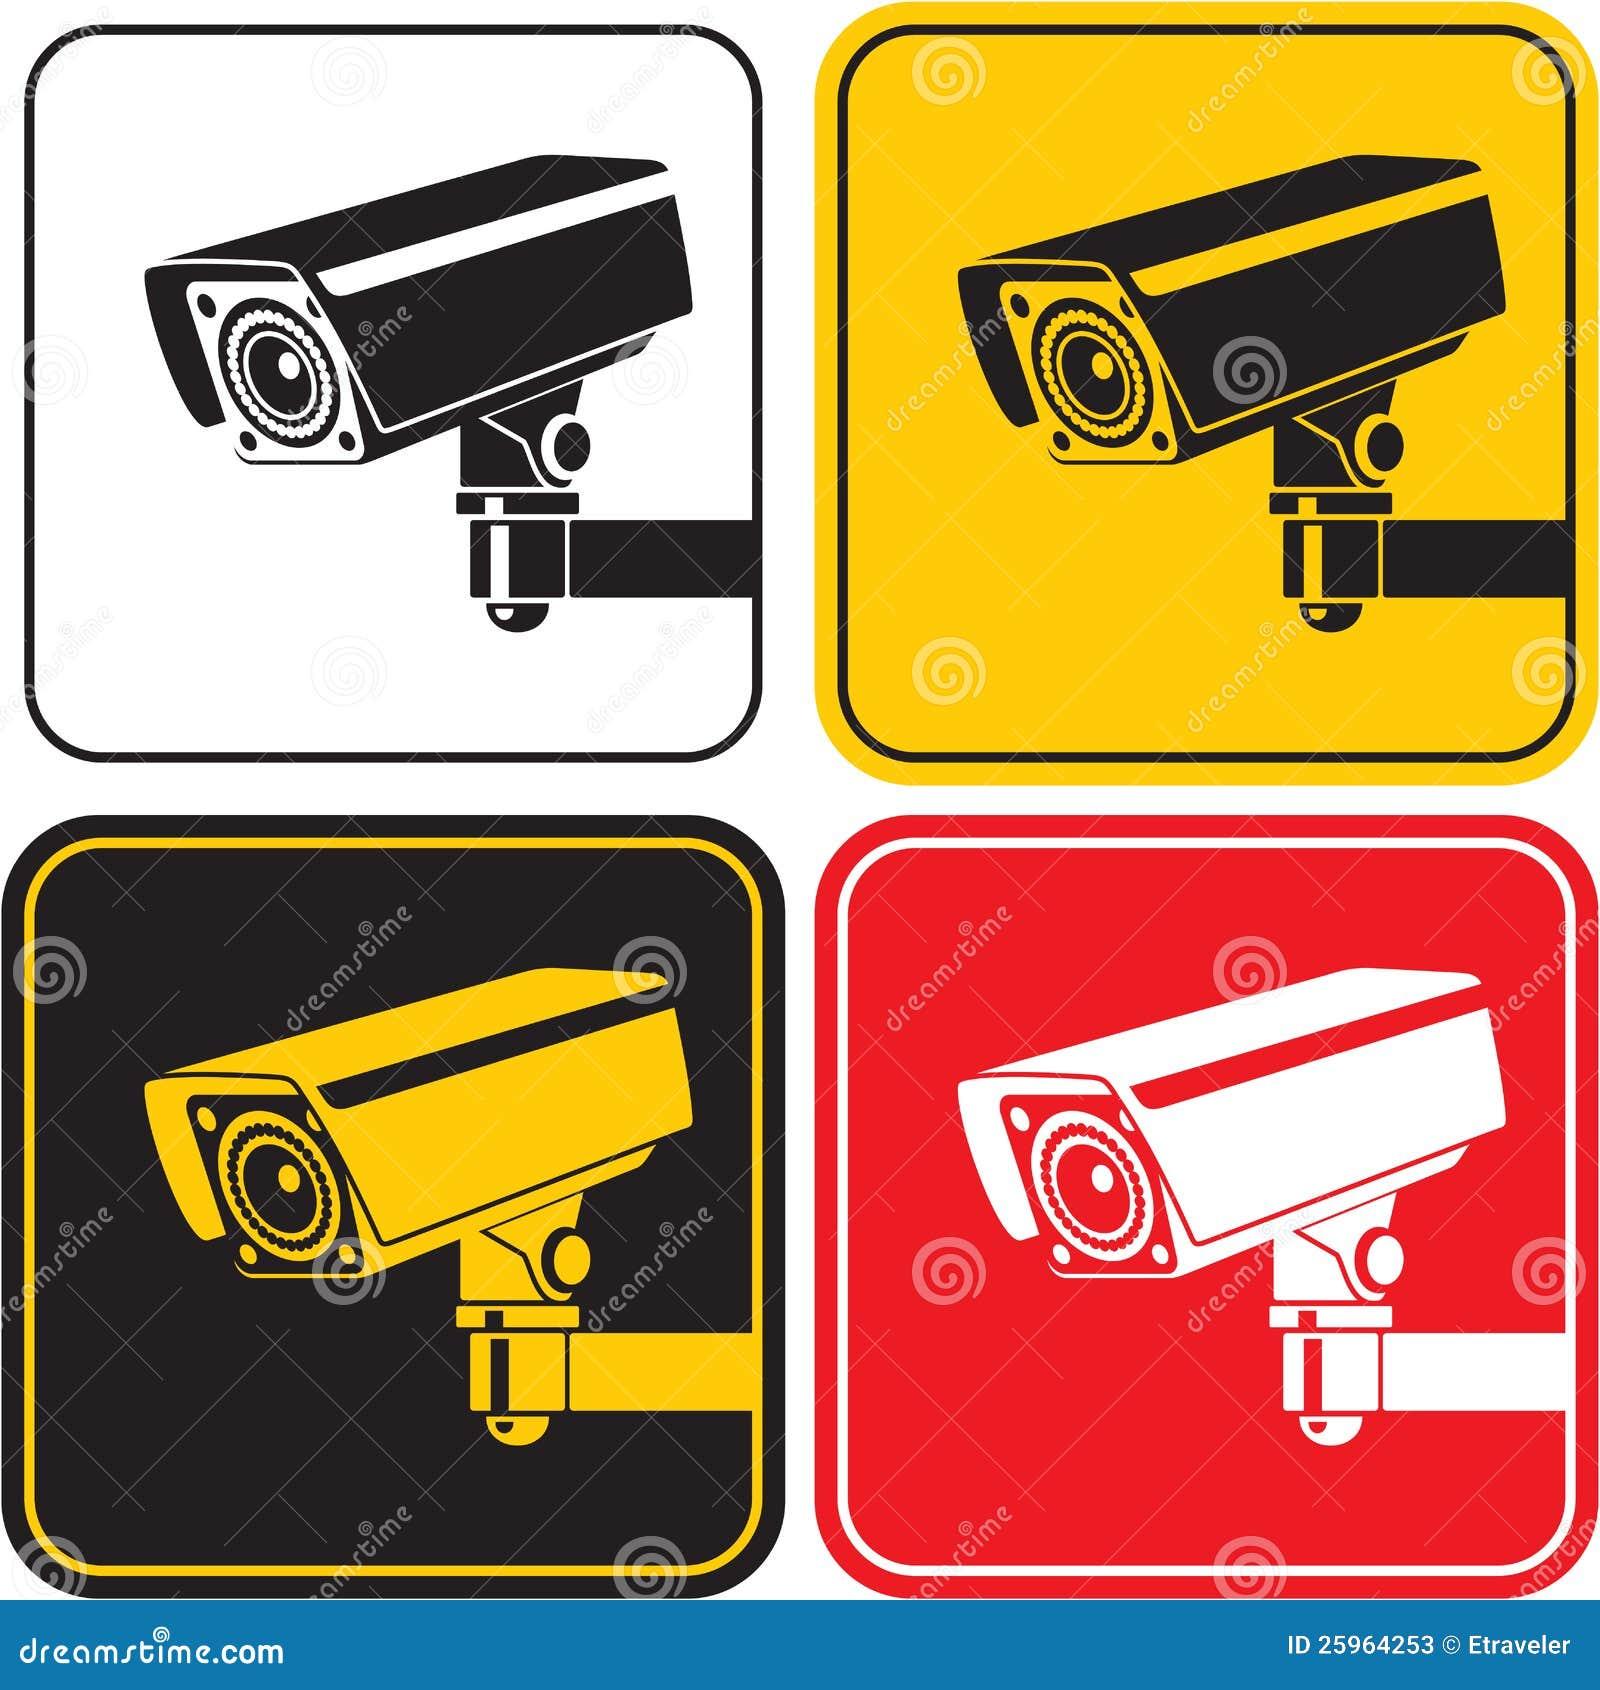 Surveillance Camera Stock Photos Image 25964253